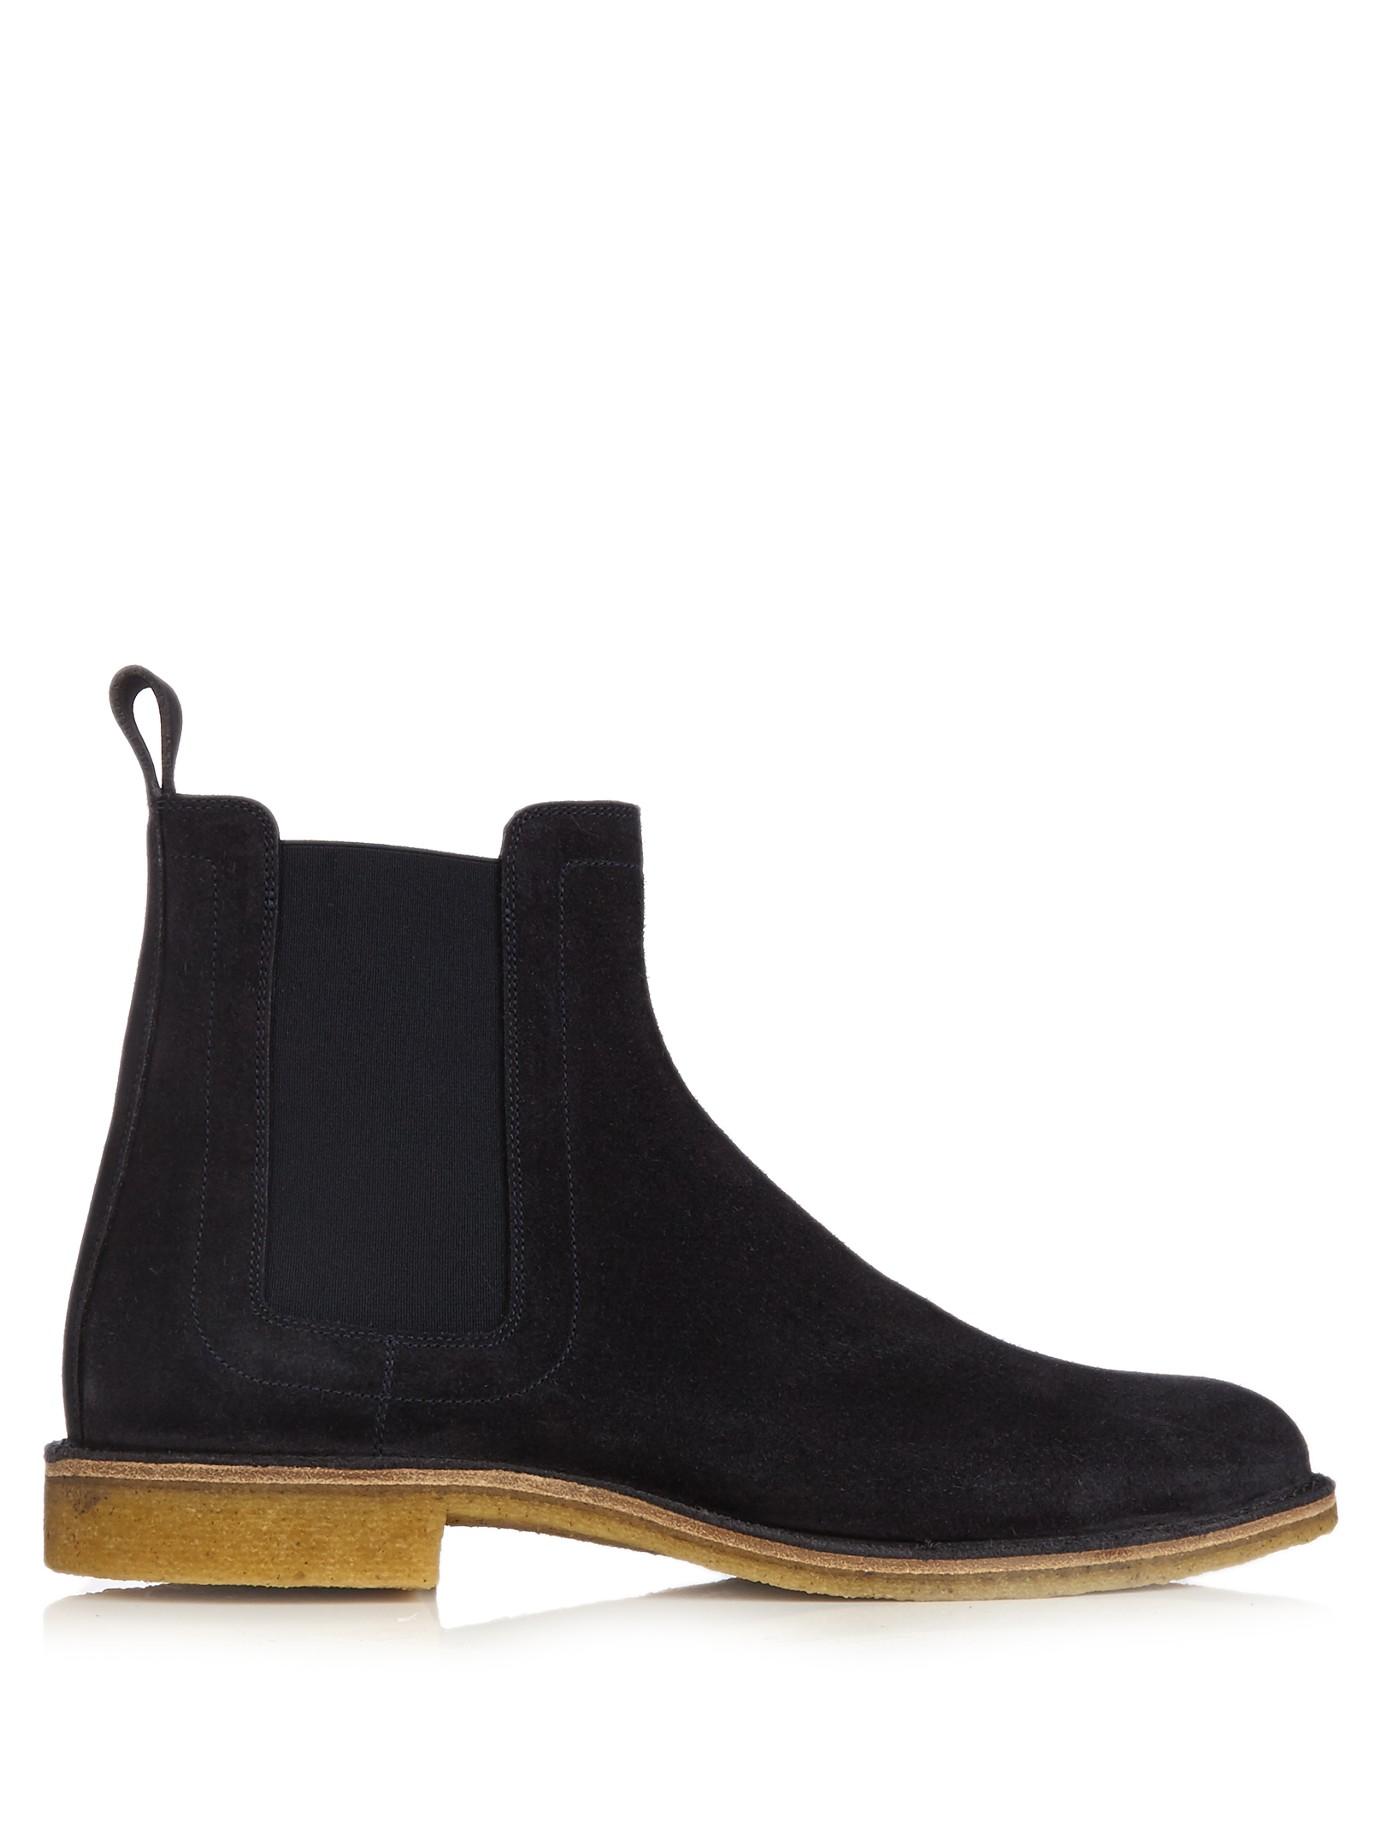 bottega veneta chelsea boots review